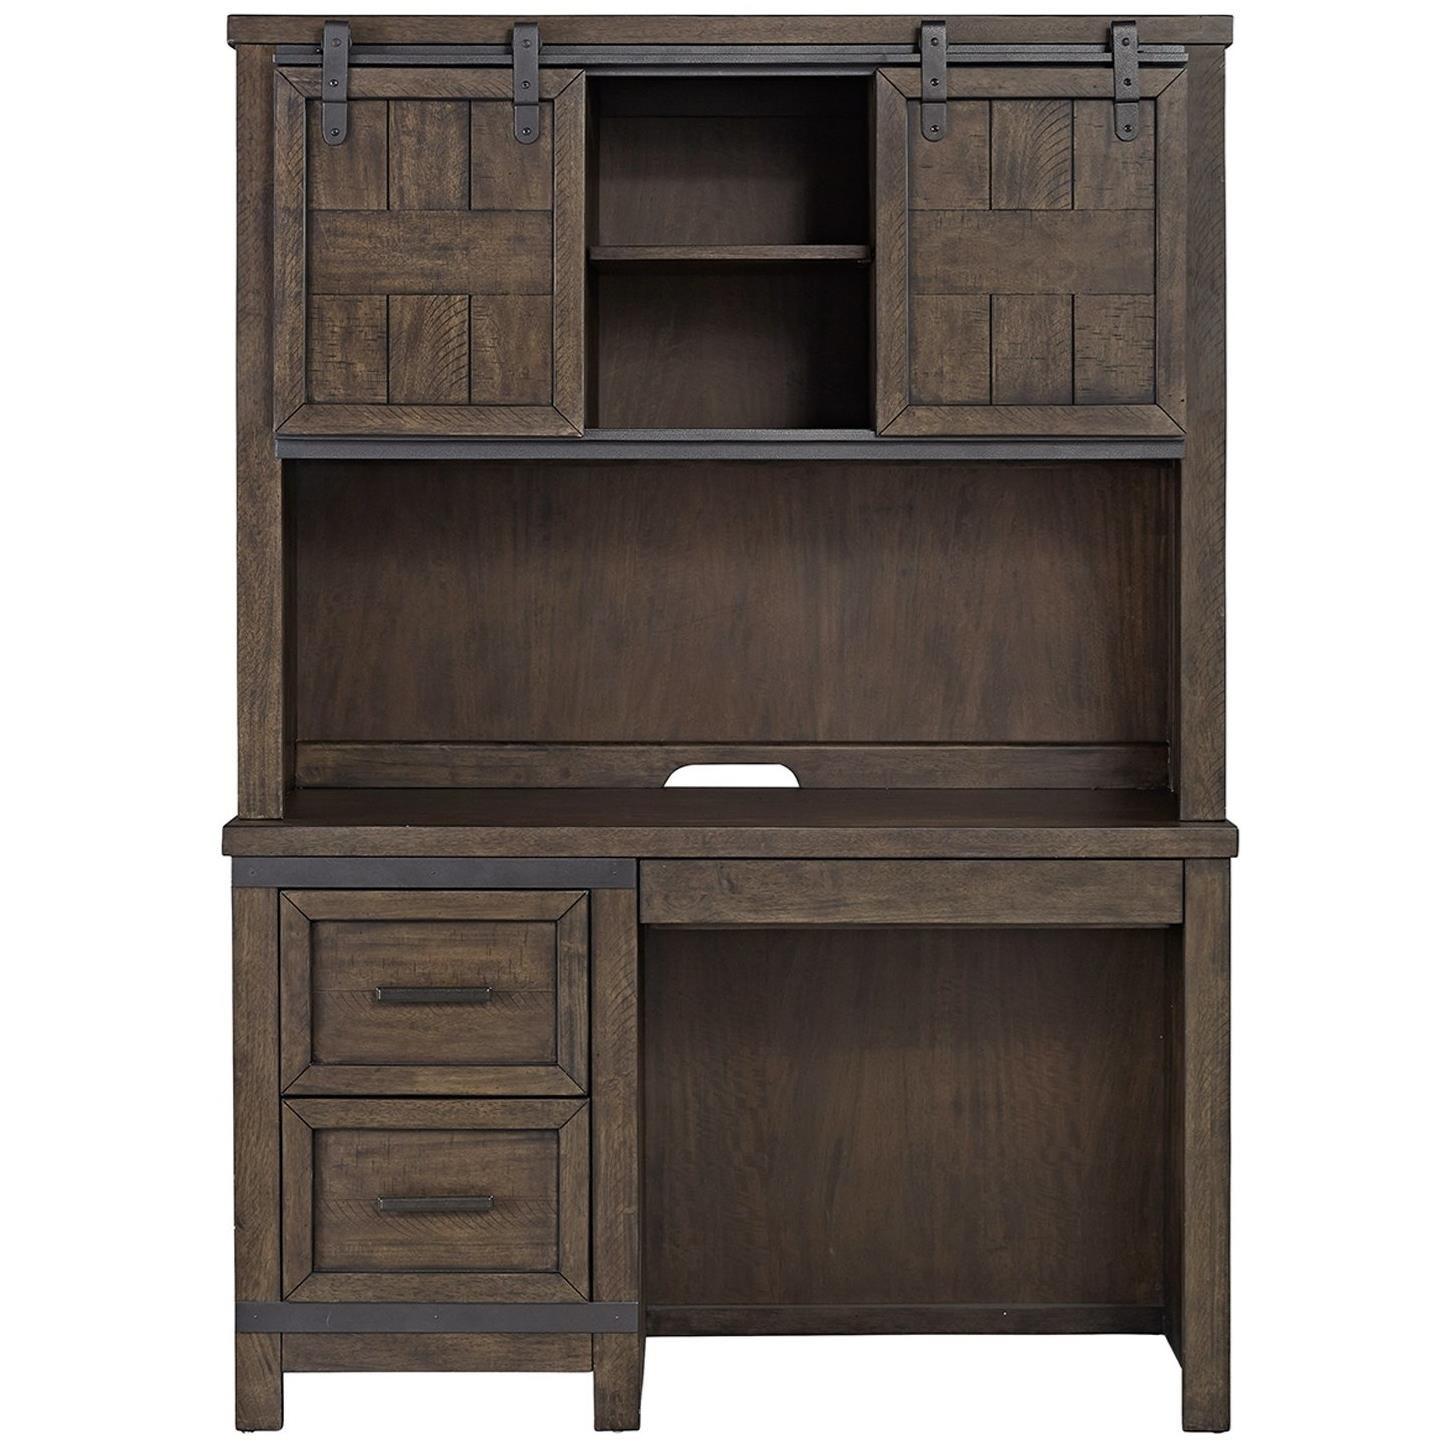 Liberty Furniture Thornwood HillsStudent Desk